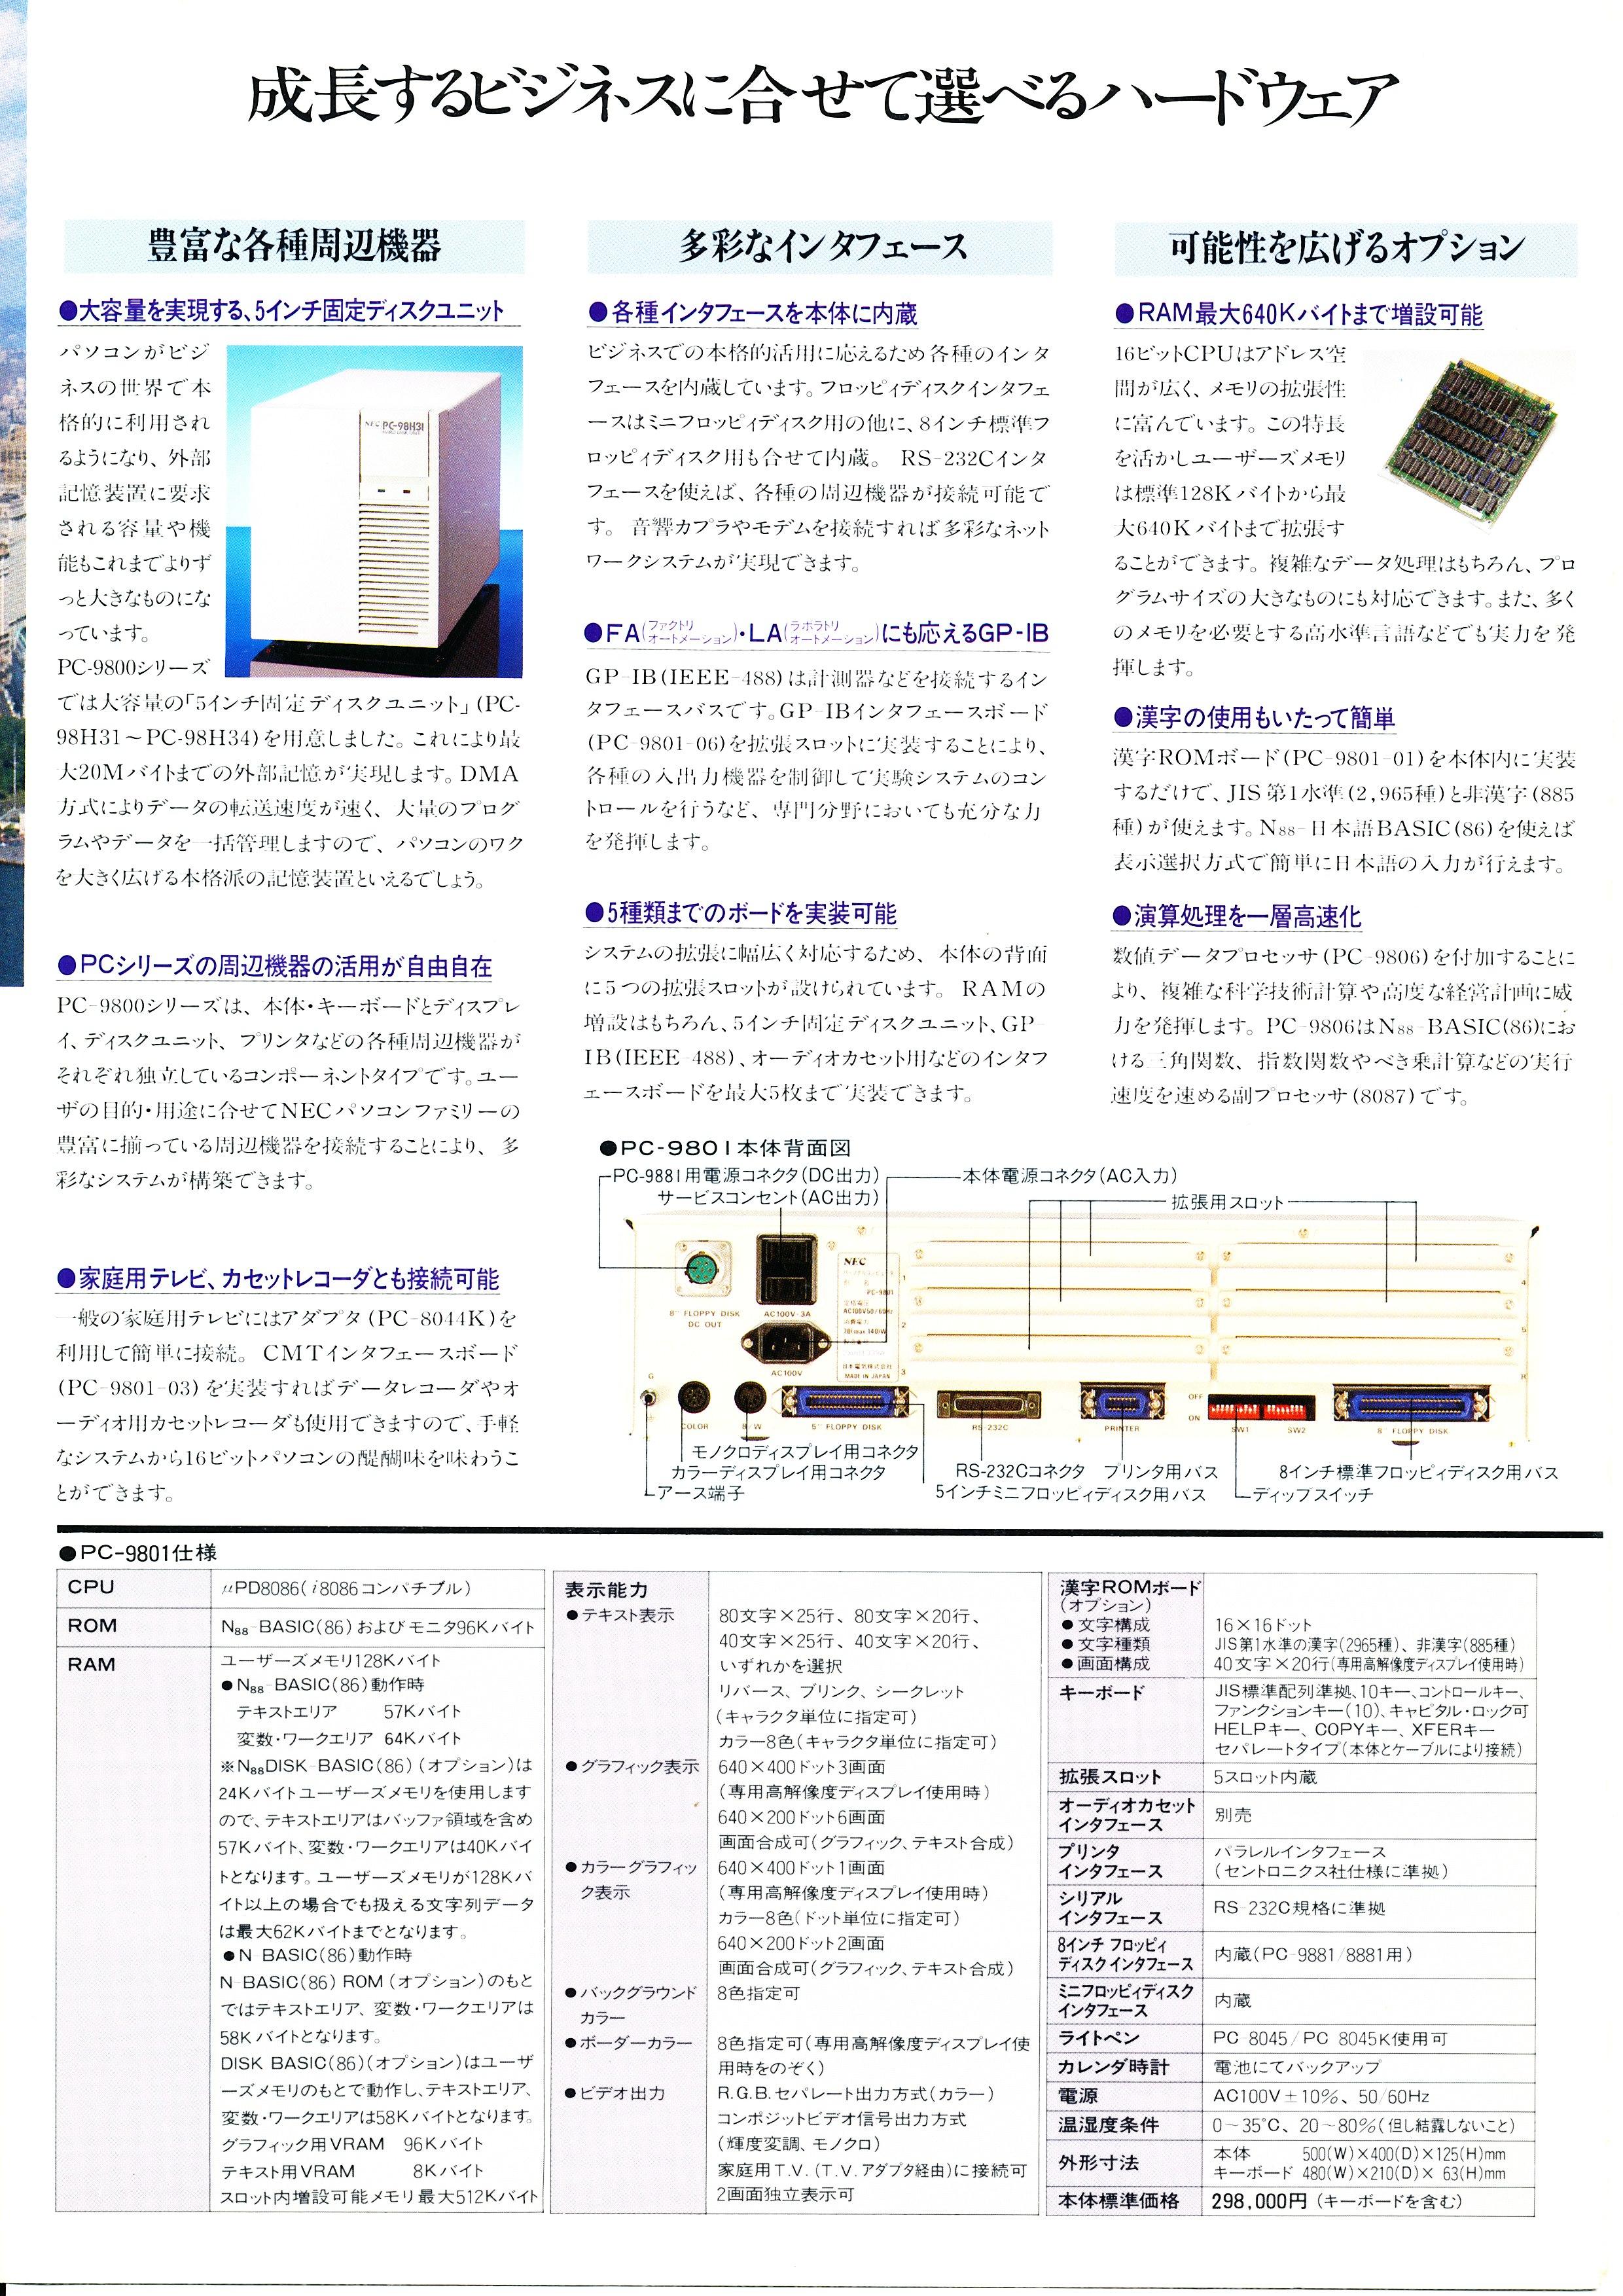 PC-9801 P4